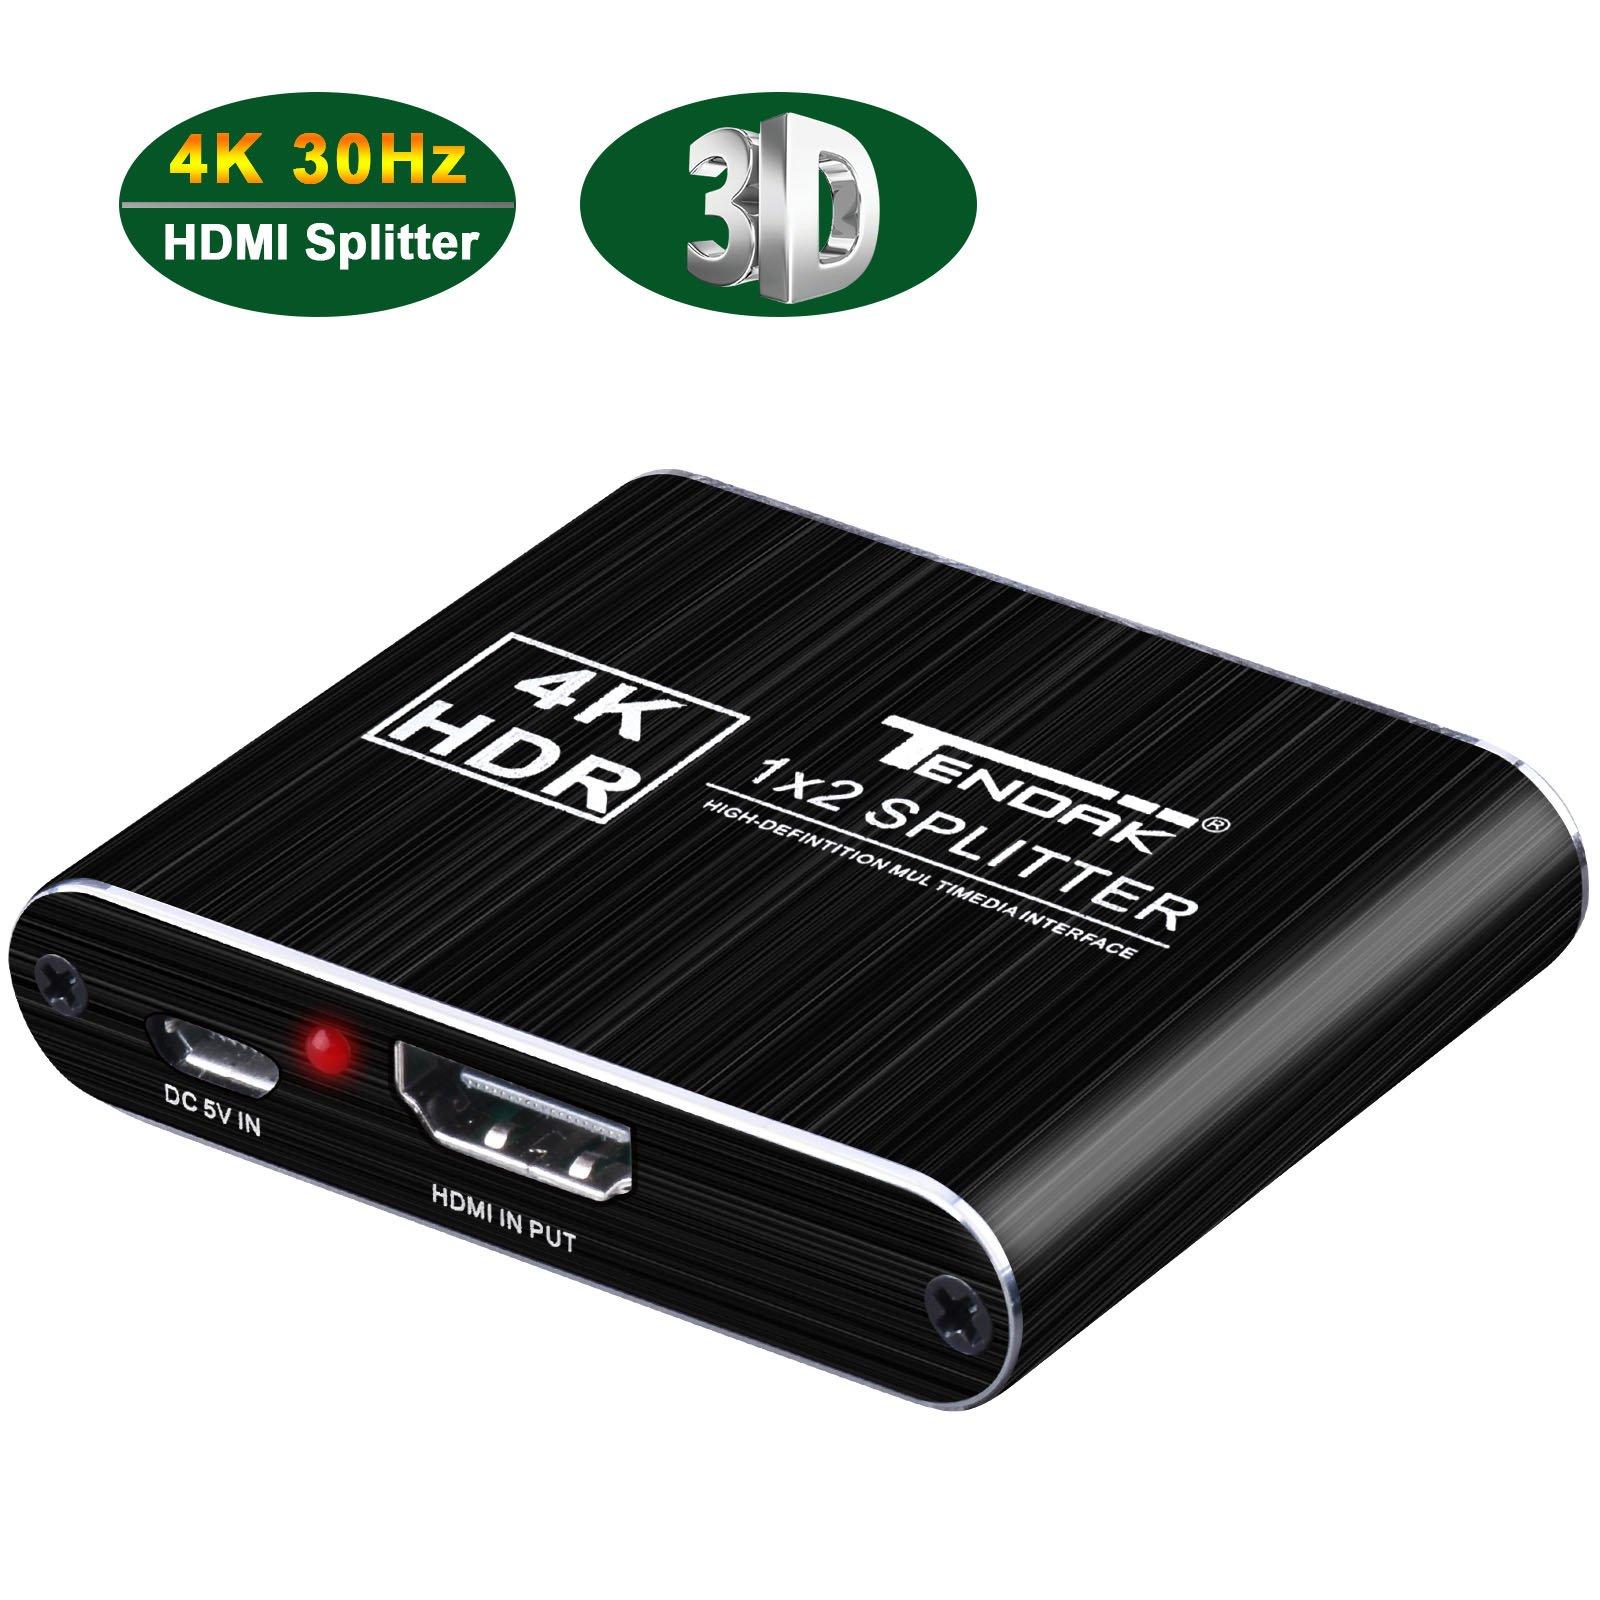 1x2 HDMI Splitter, Tendak 4K 1 In 2 Out HDMI Signal Powered Splitter Amplifier Adapter Box Support 4k@30HZ 1080P 3D for Roku/PS3/4/DVD/XBox One/HDTV by Tendak (Image #1)